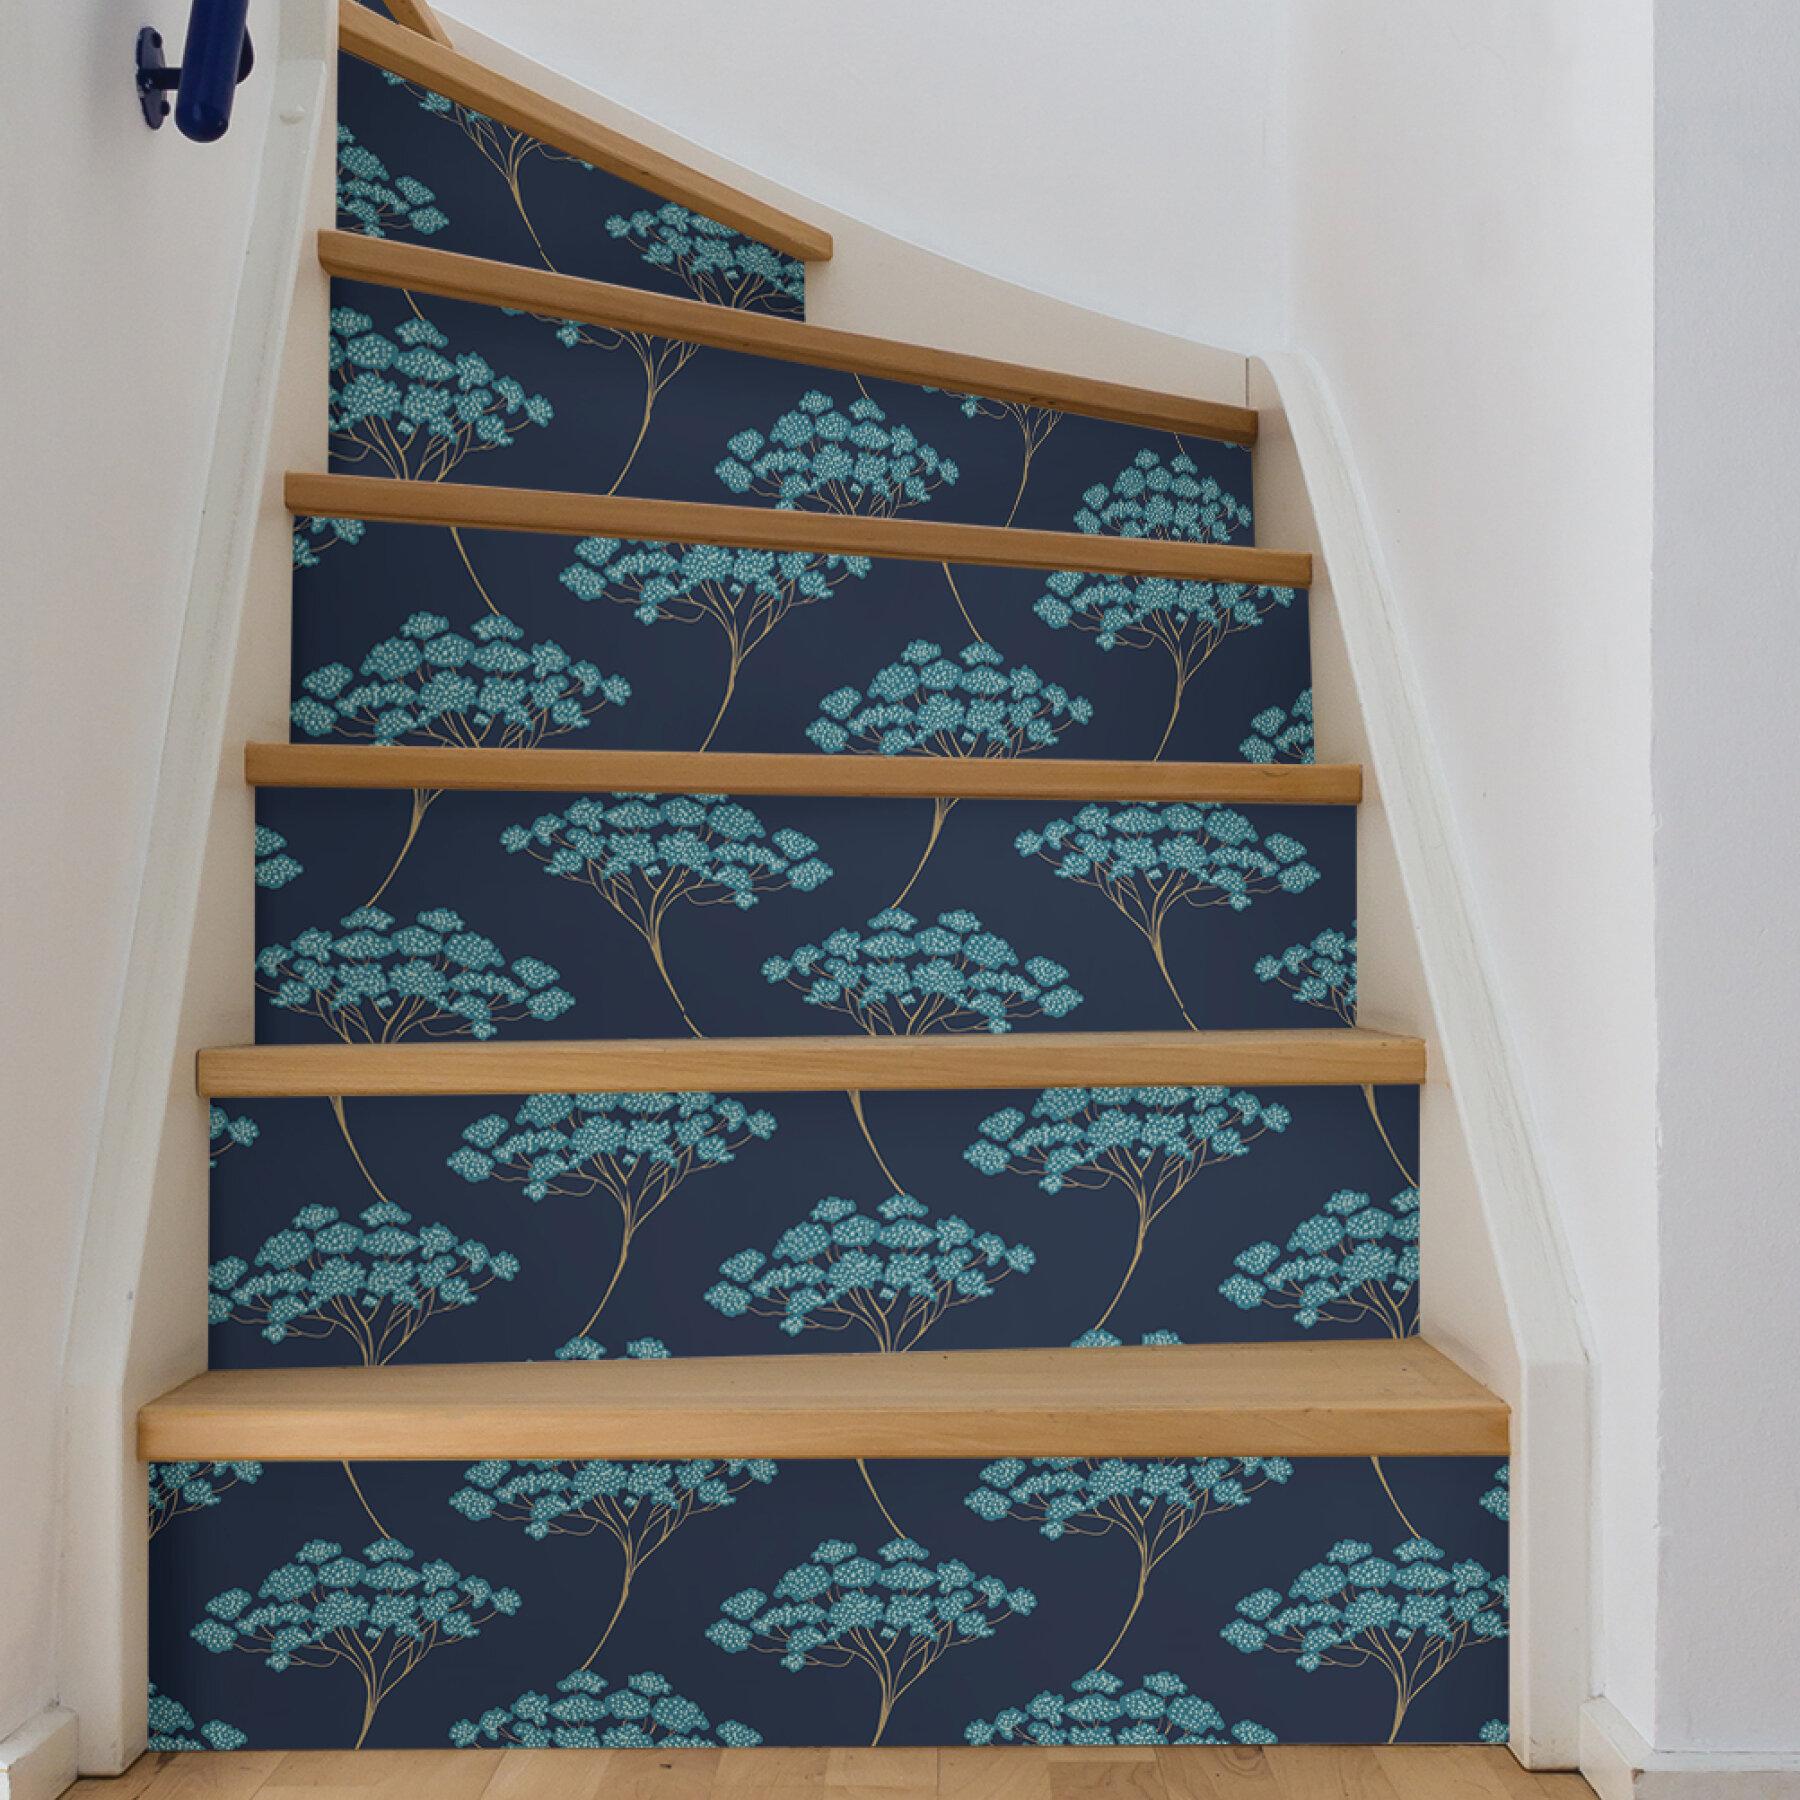 World Menagerie Hibbs Ficus 216 L X 20 5 W Peel And Stick Wallpaper Roll Reviews Wayfair